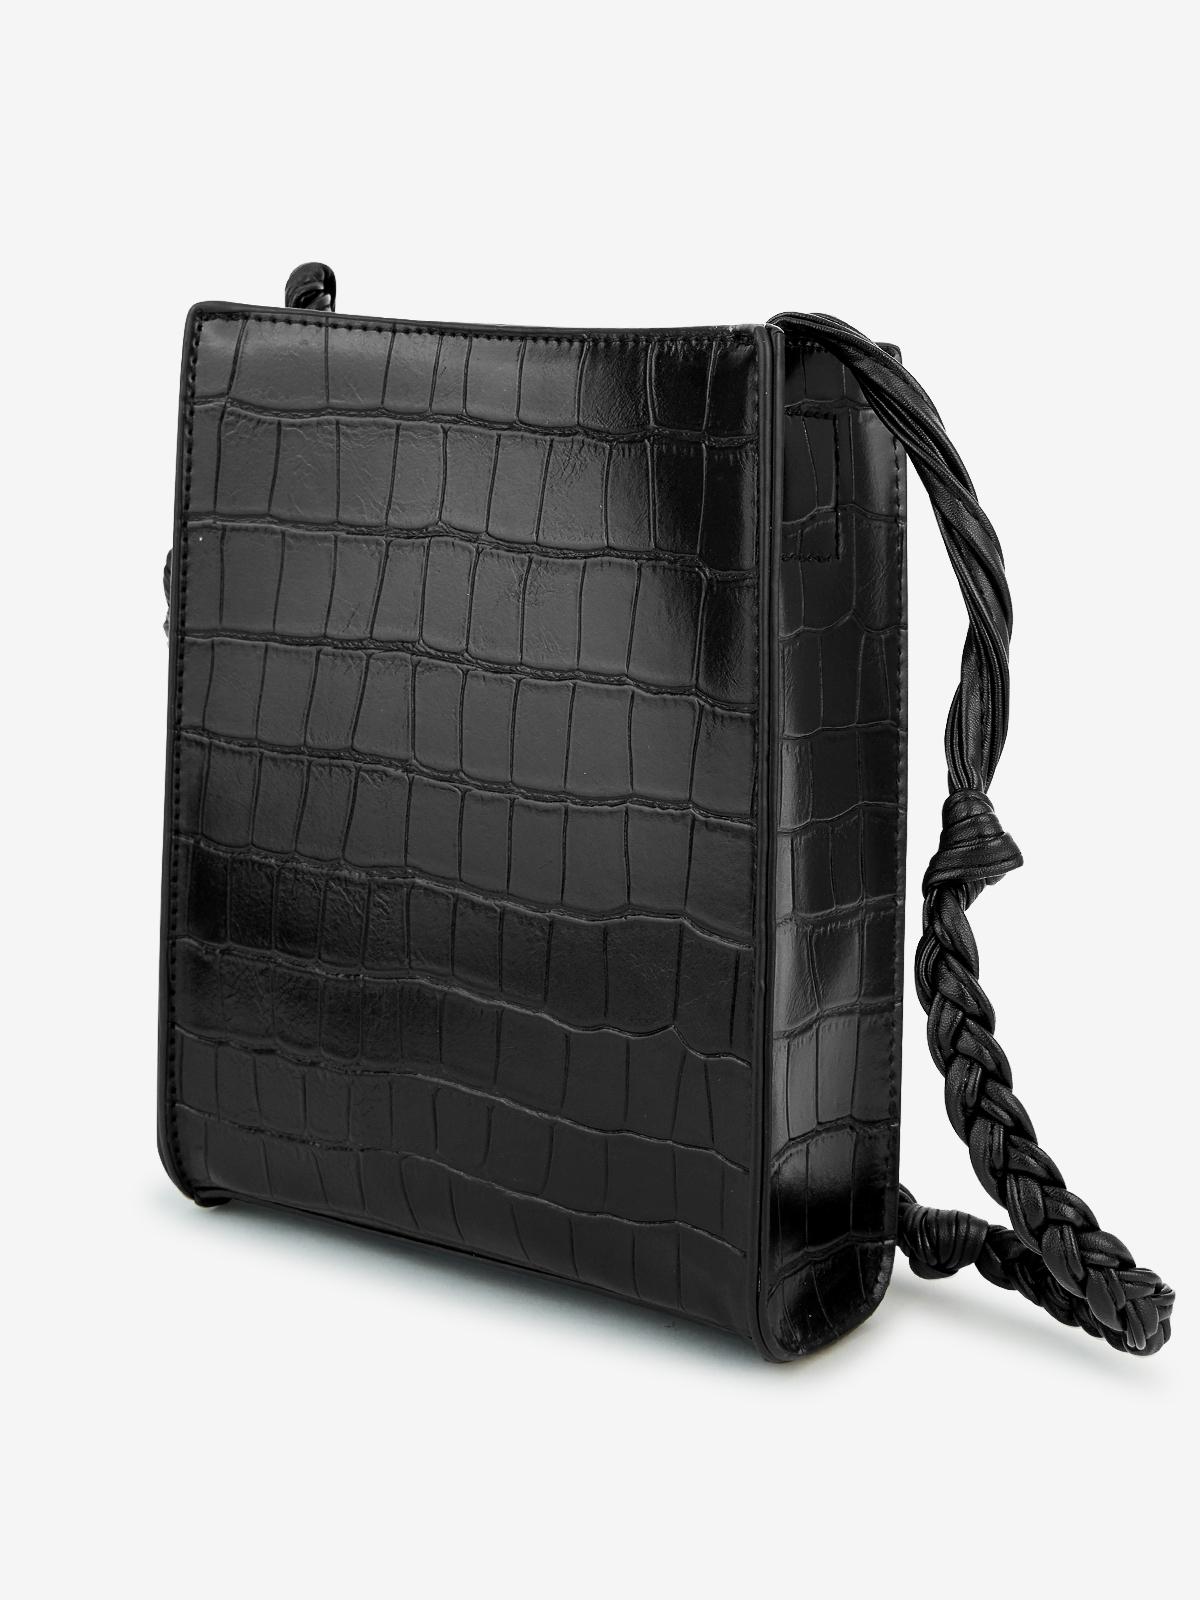 Croc Embossed Crossbody Bag Black